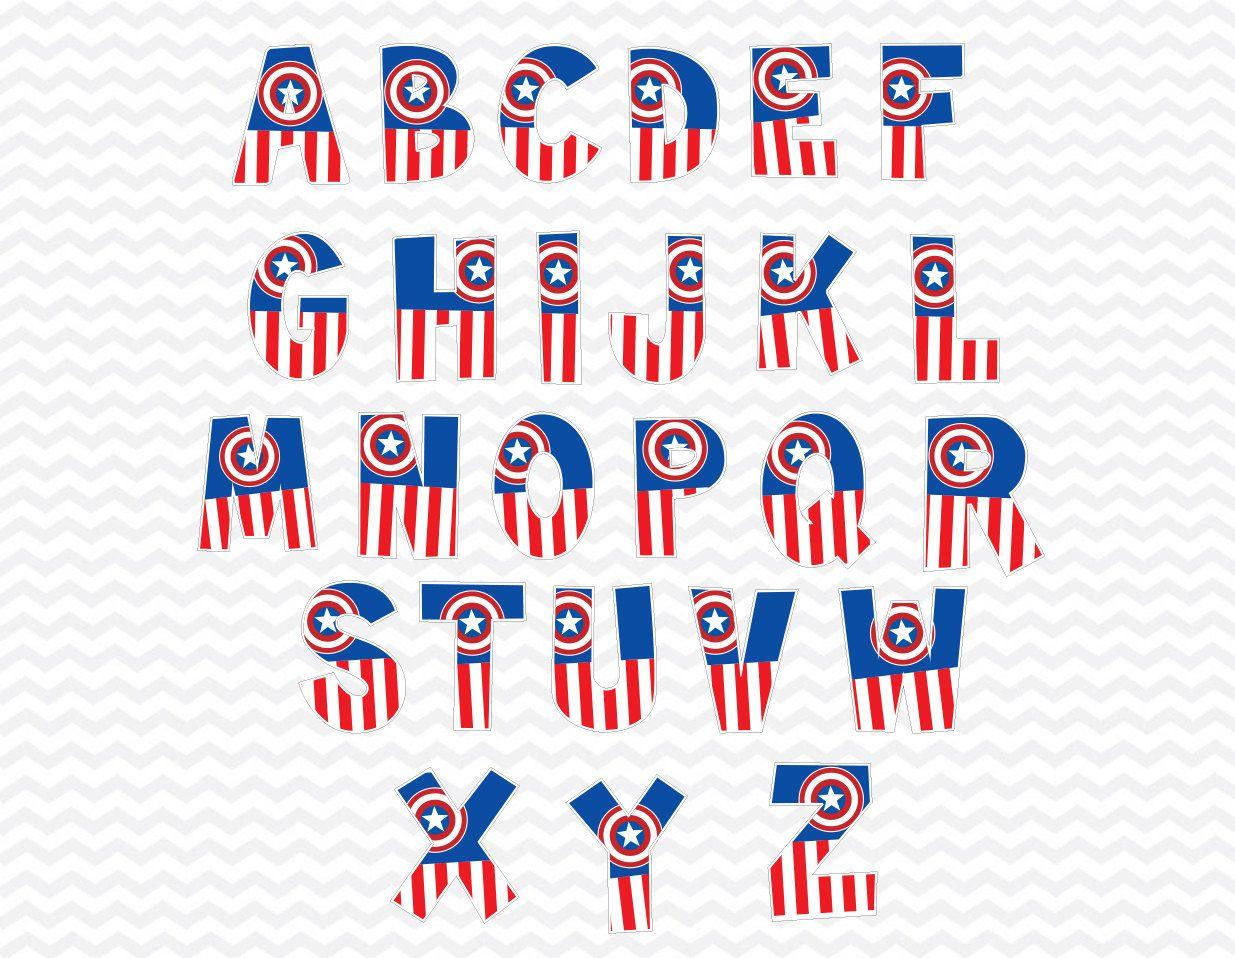 Captain america alphabet superhero alphabet png superhero captain america alphabet superhero alphabet png superhero alphabets super hero alphabets super altavistaventures Gallery